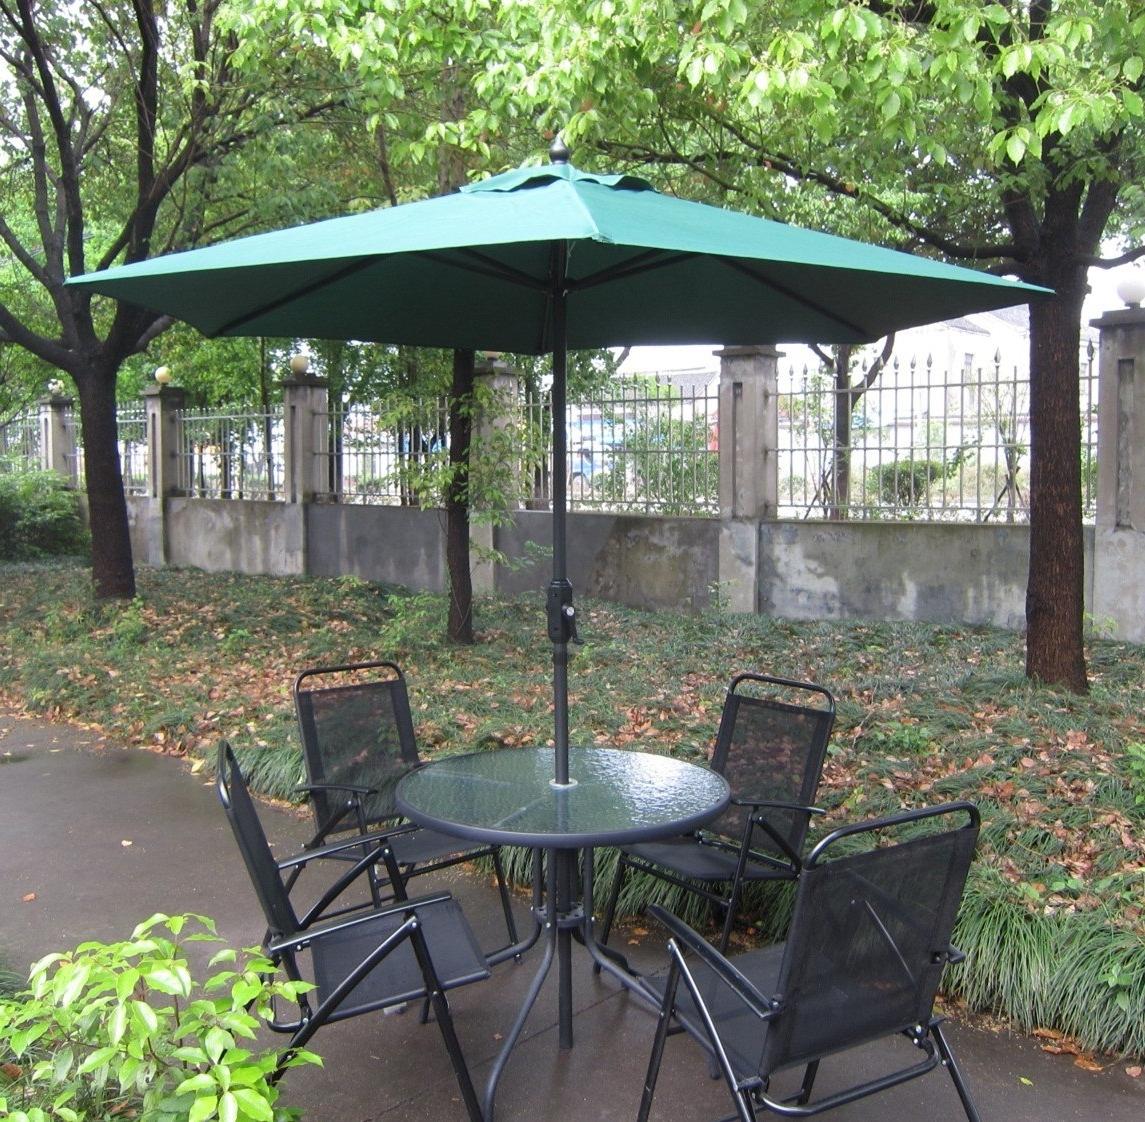 European Patio Umbrellas Regarding Well Known European Umbrella Outdoor Umbrellas Uv Sun Base Iron Pillar Holder (View 8 of 20)